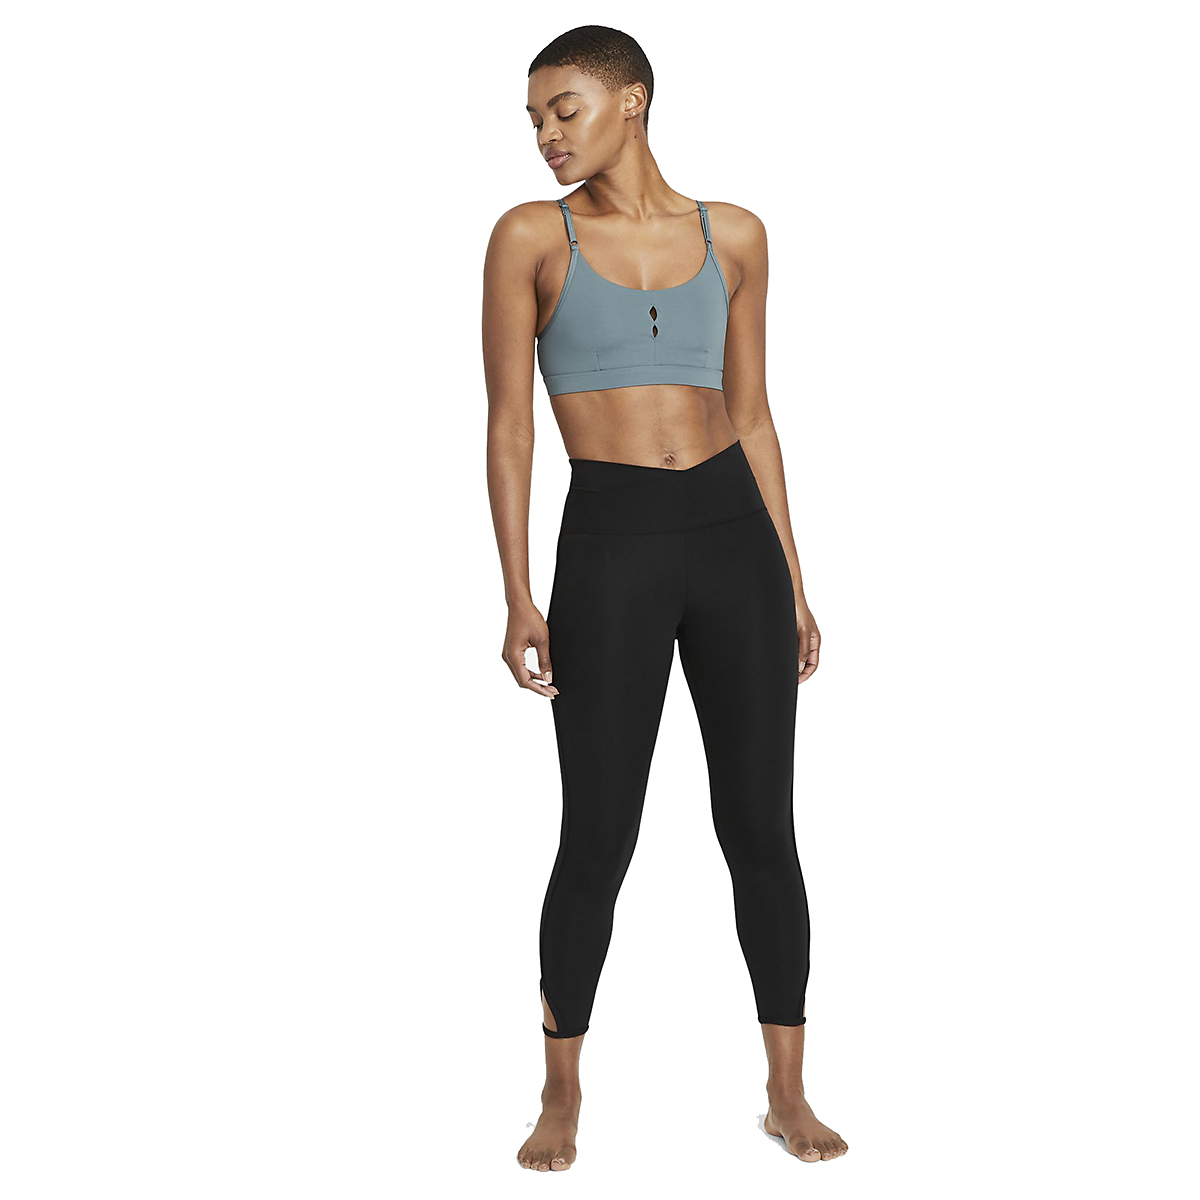 Women's Nike Yoga Dri-FIT Indy Essentials Bra - Color: Hasta/Dark Teal - Size: XS, Hasta/Dark Teal, large, image 4